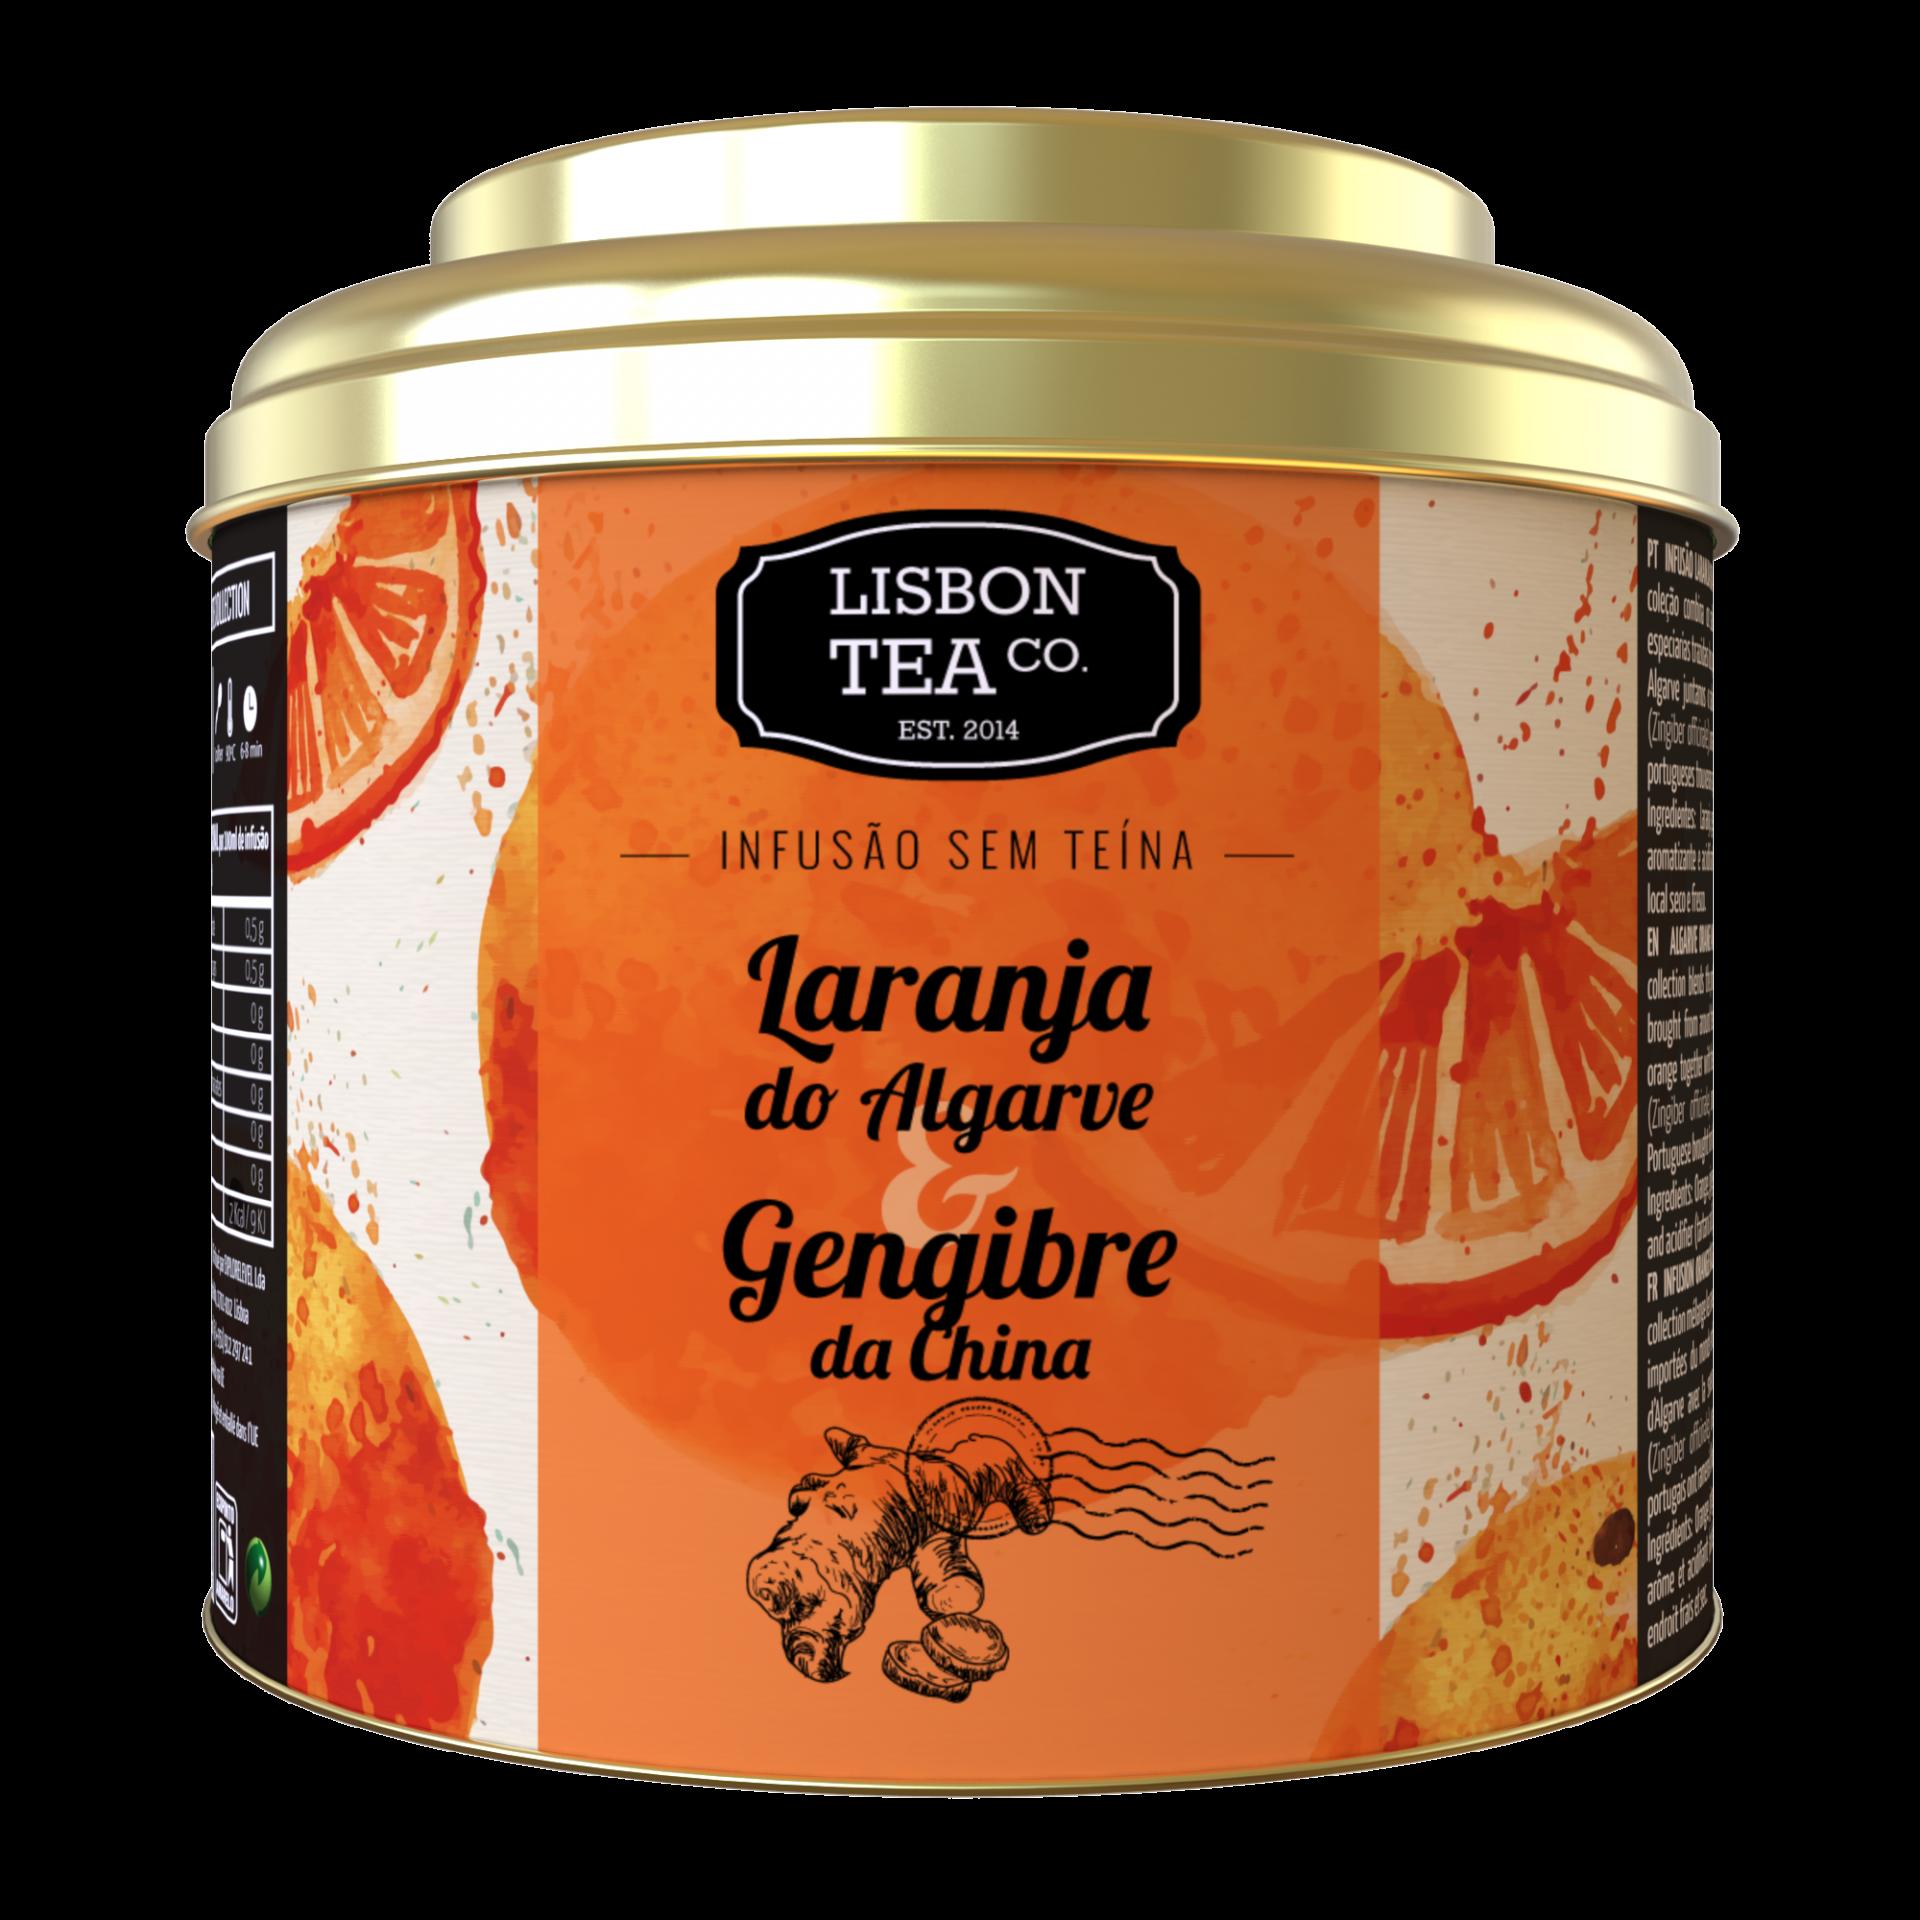 Lisbon Tea Laranja & Gengibre Infusão